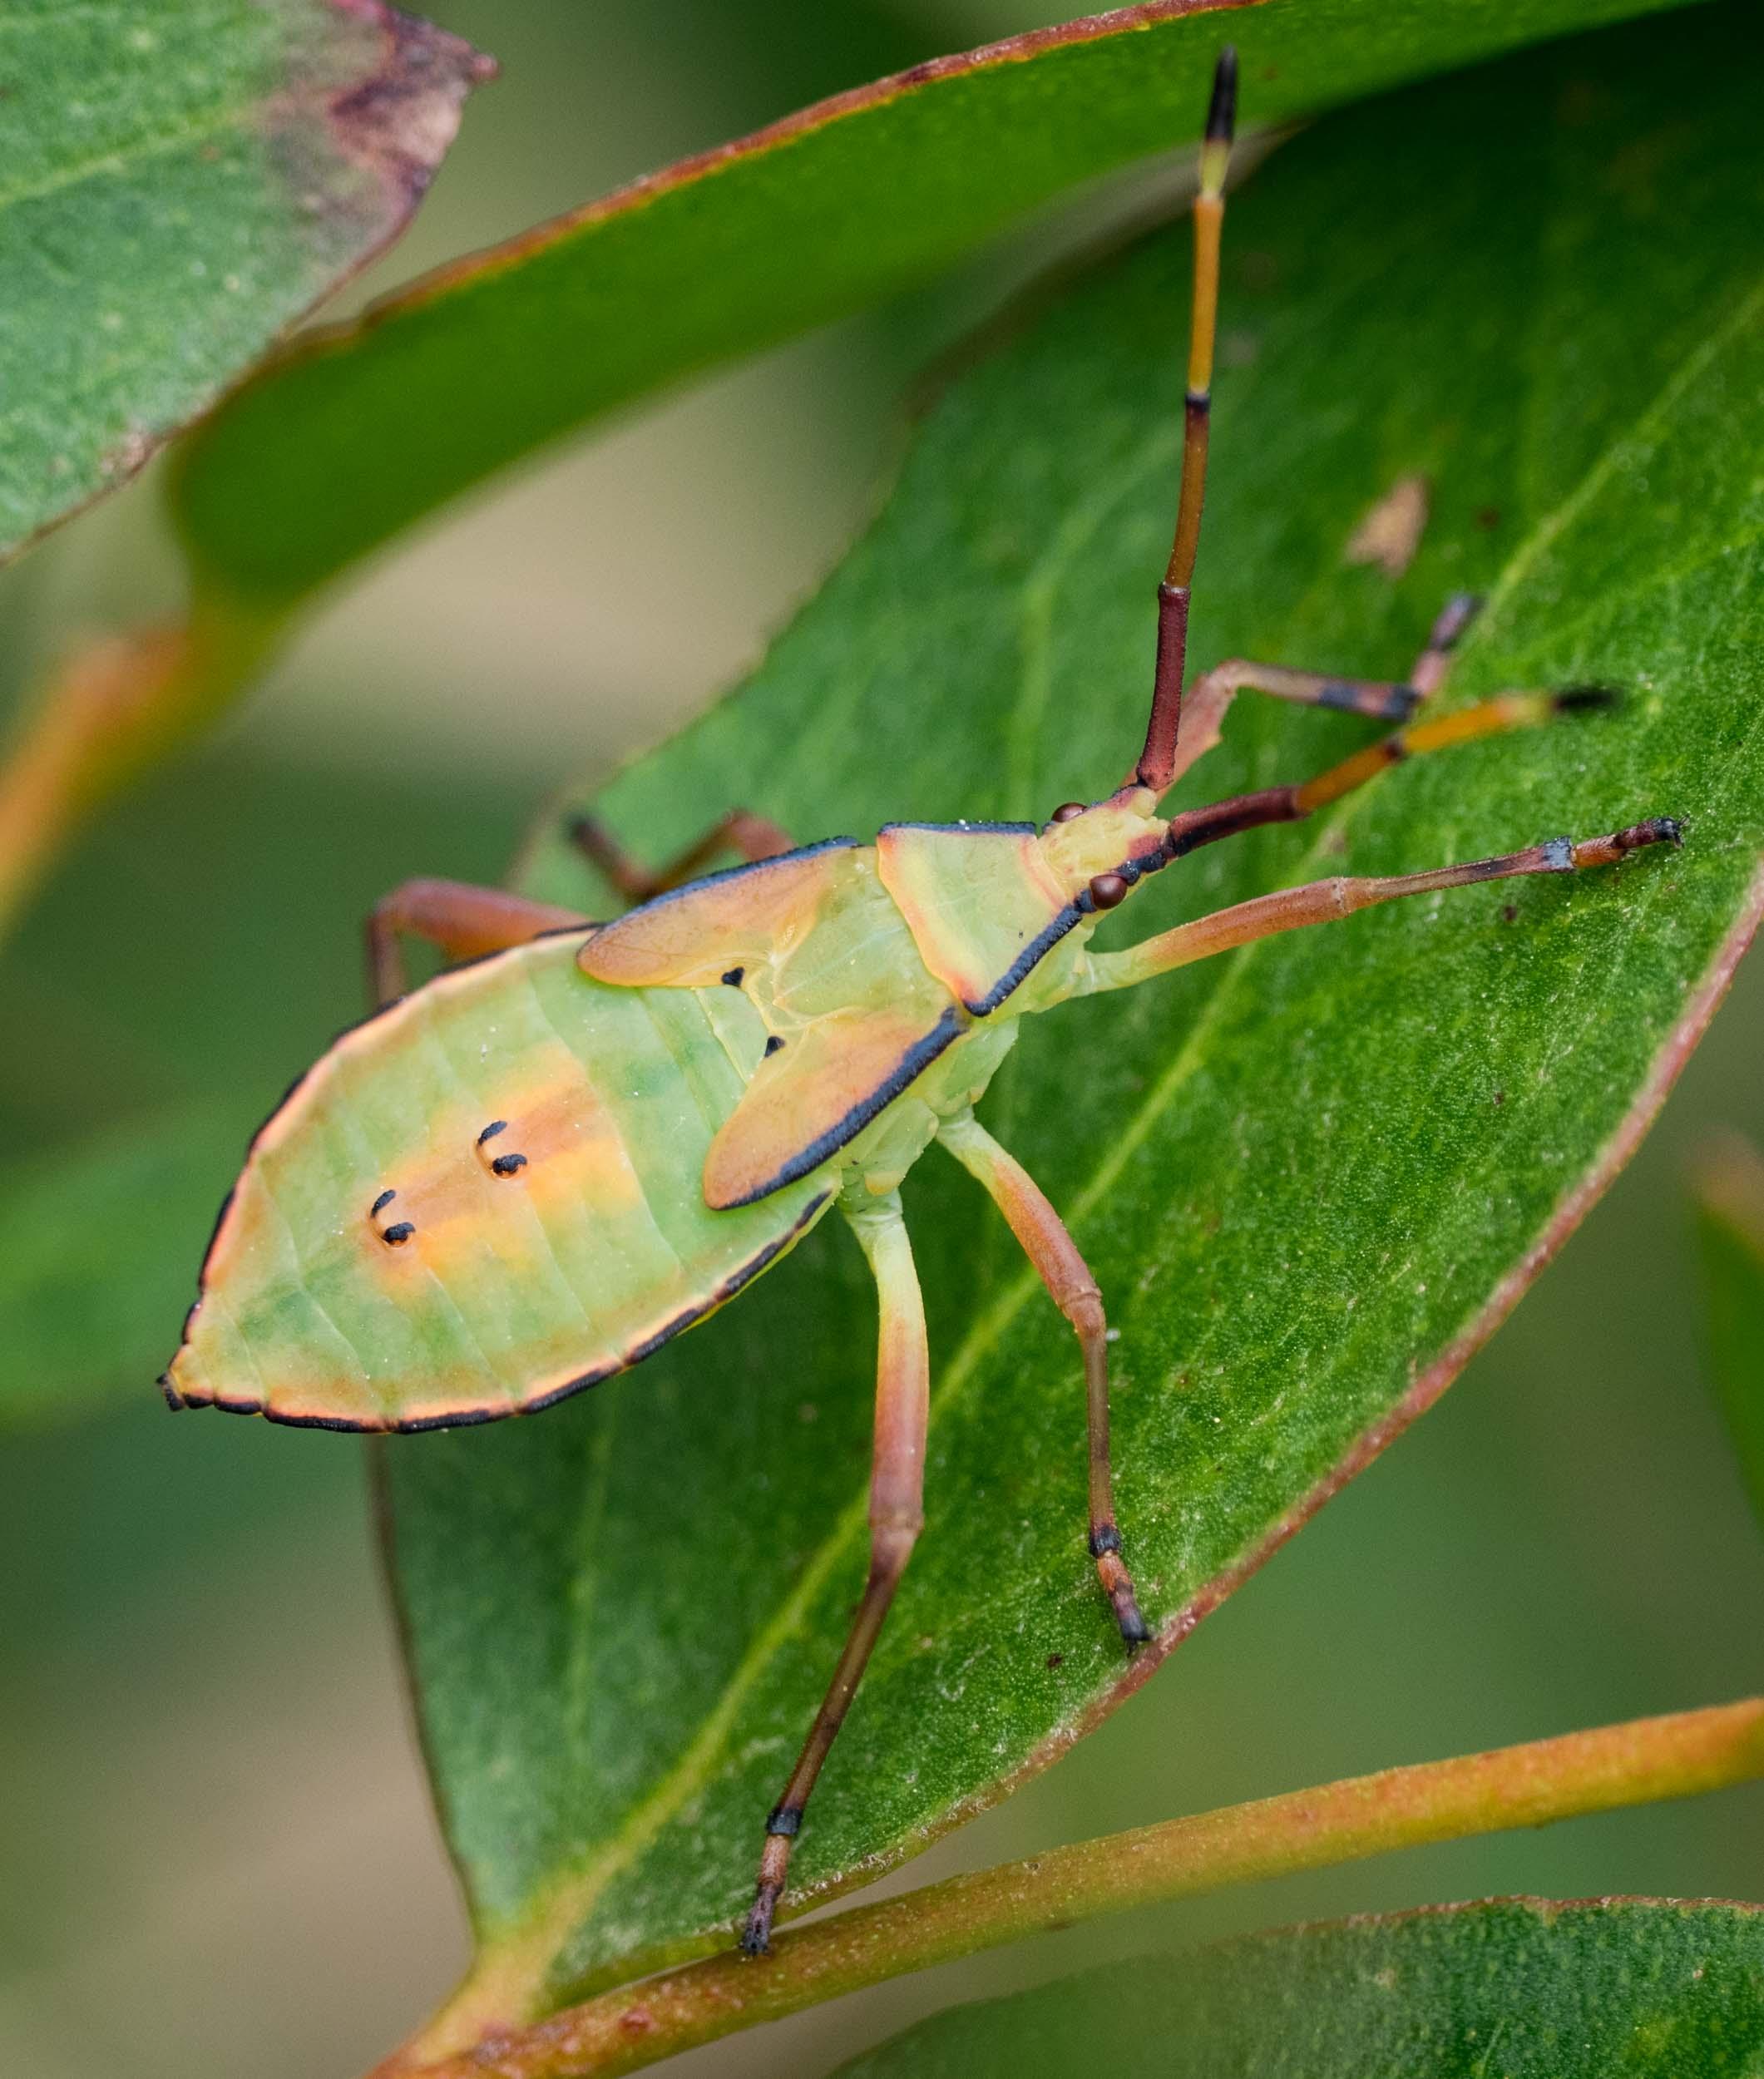 Tip-wilting Bug,  Amorbus sp .  Order: Hemiptera; Family: Coreidae